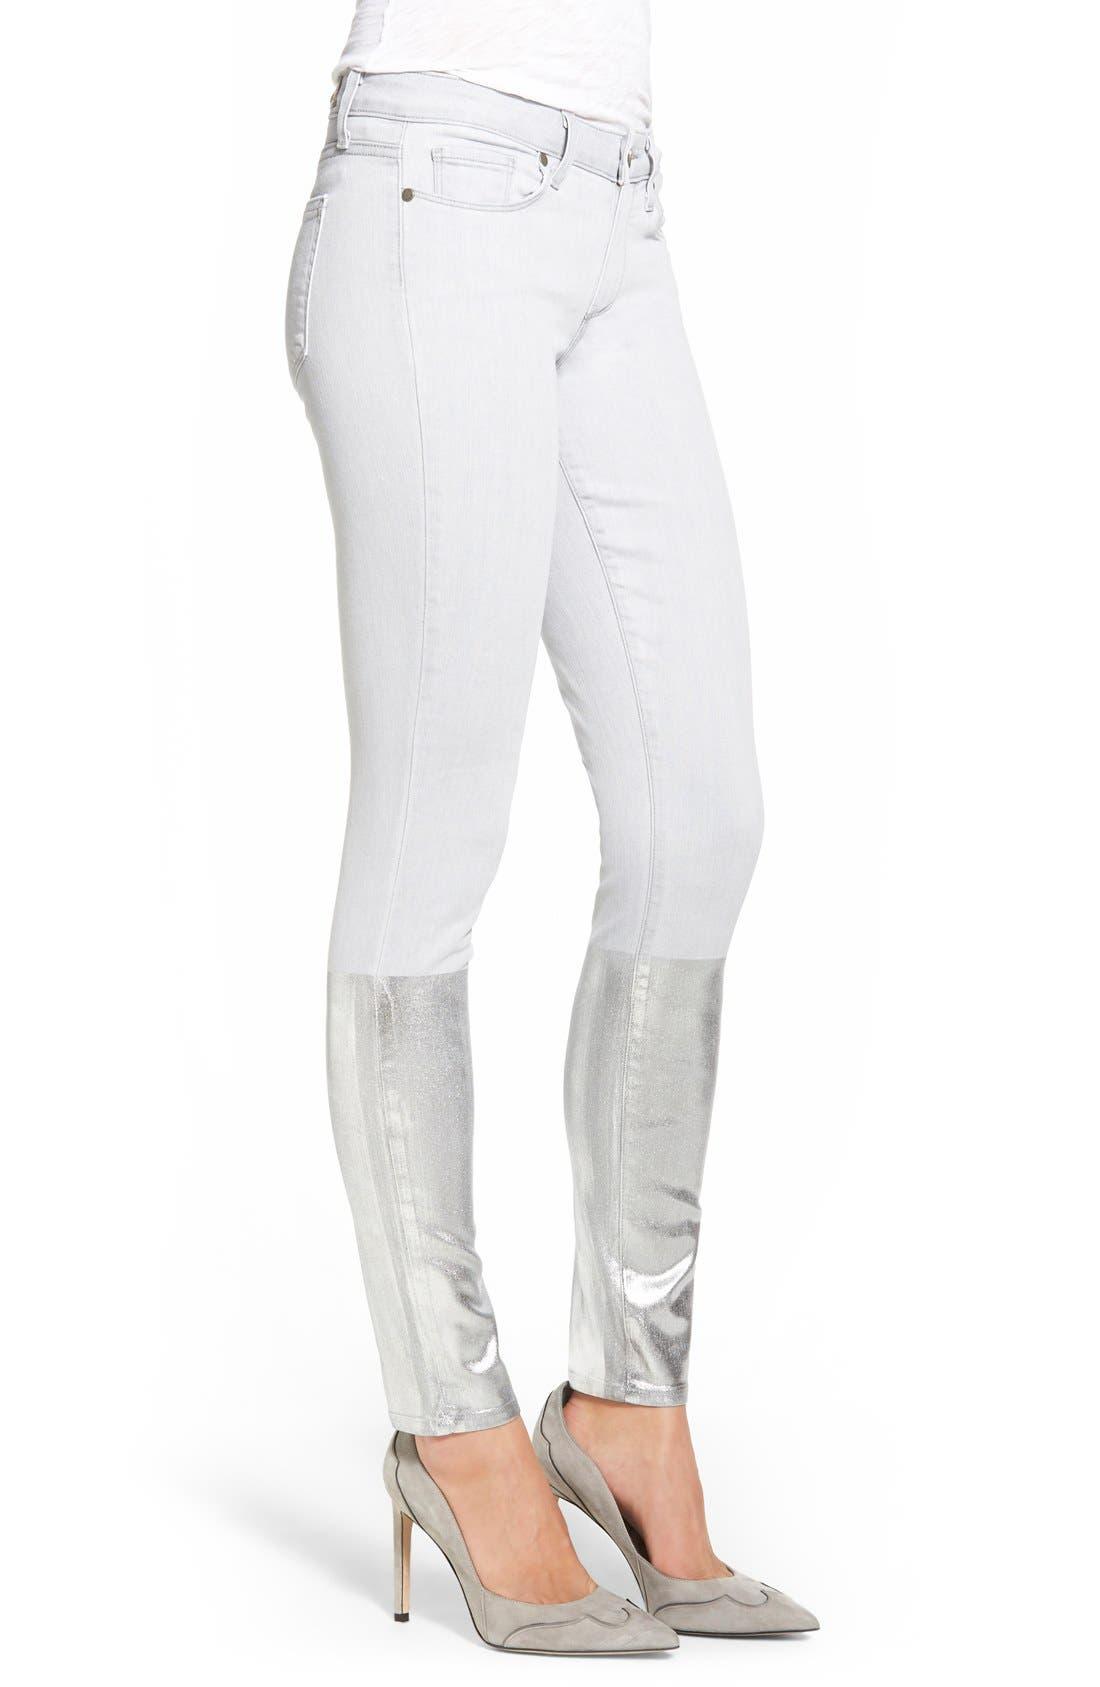 Alternate Image 2  - PaigeDenim 'Verdugo' Ankle Ultra Skinny Jeans (Light Grey/Silver Solstice)